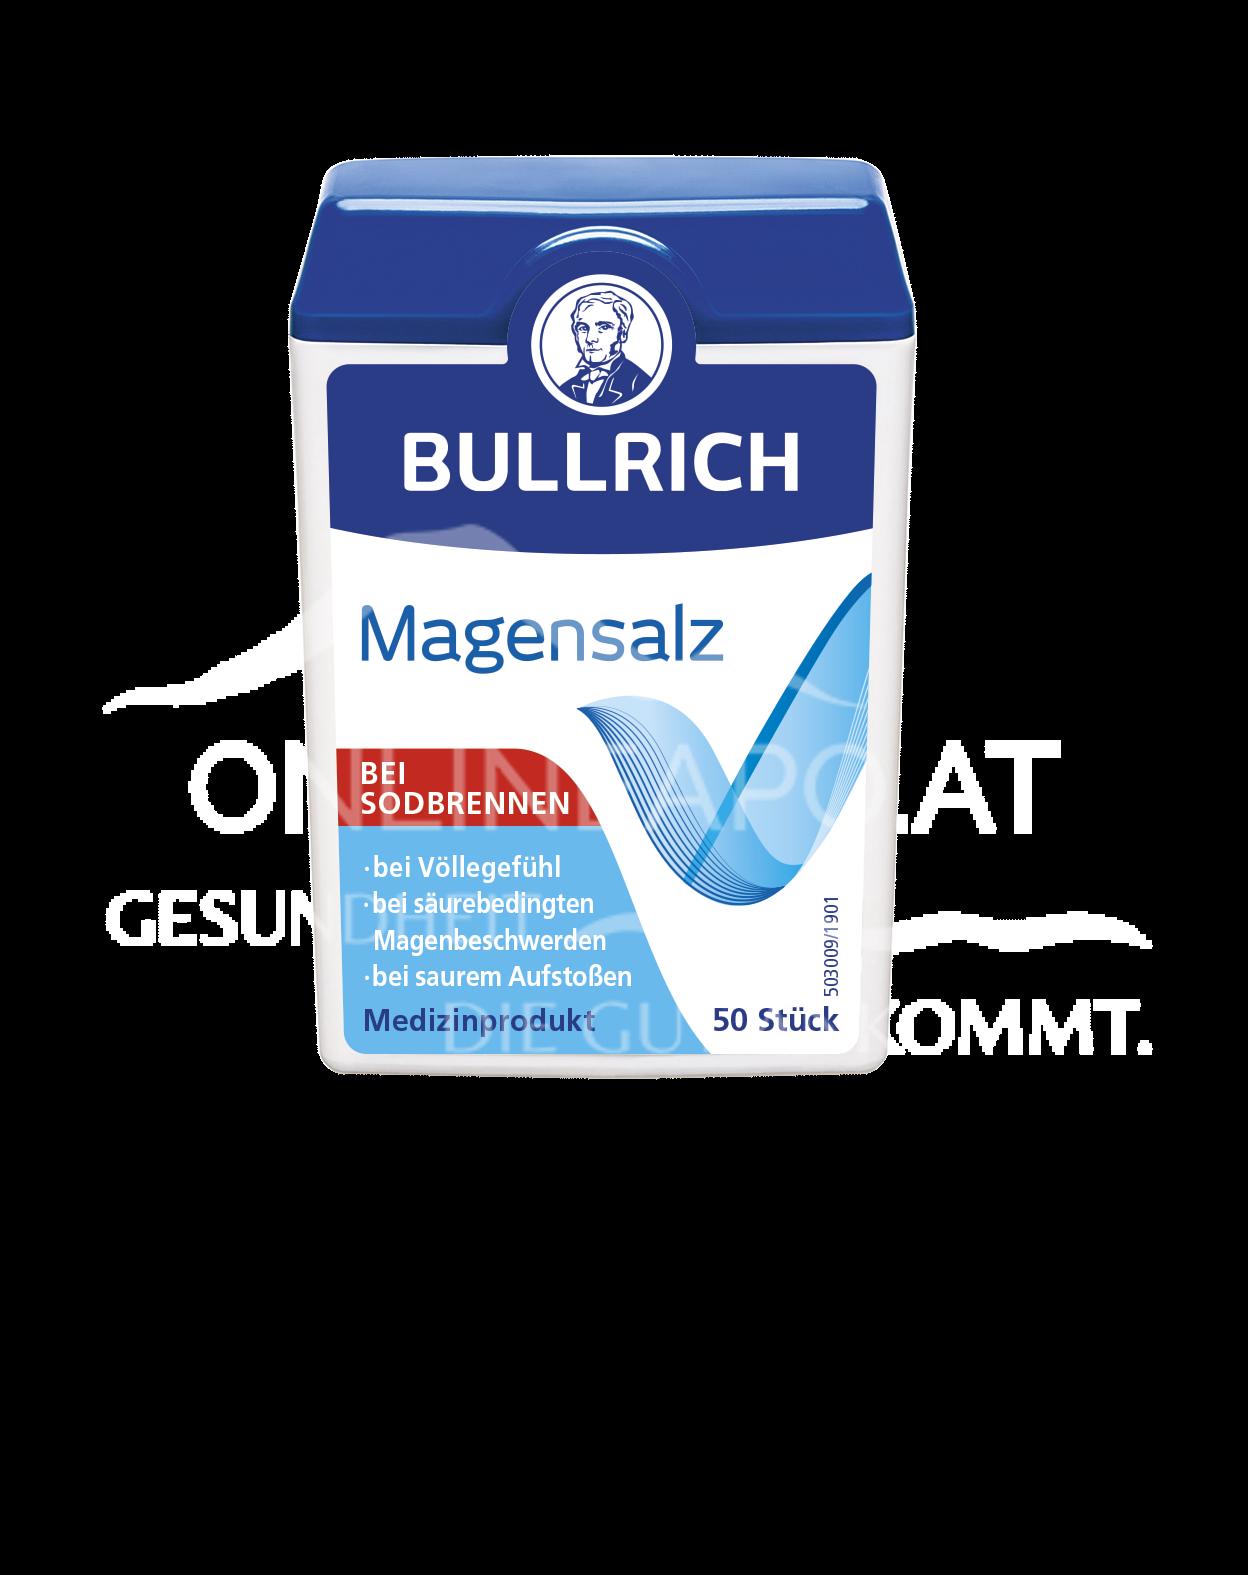 Bullrich Magensalz Tabletten